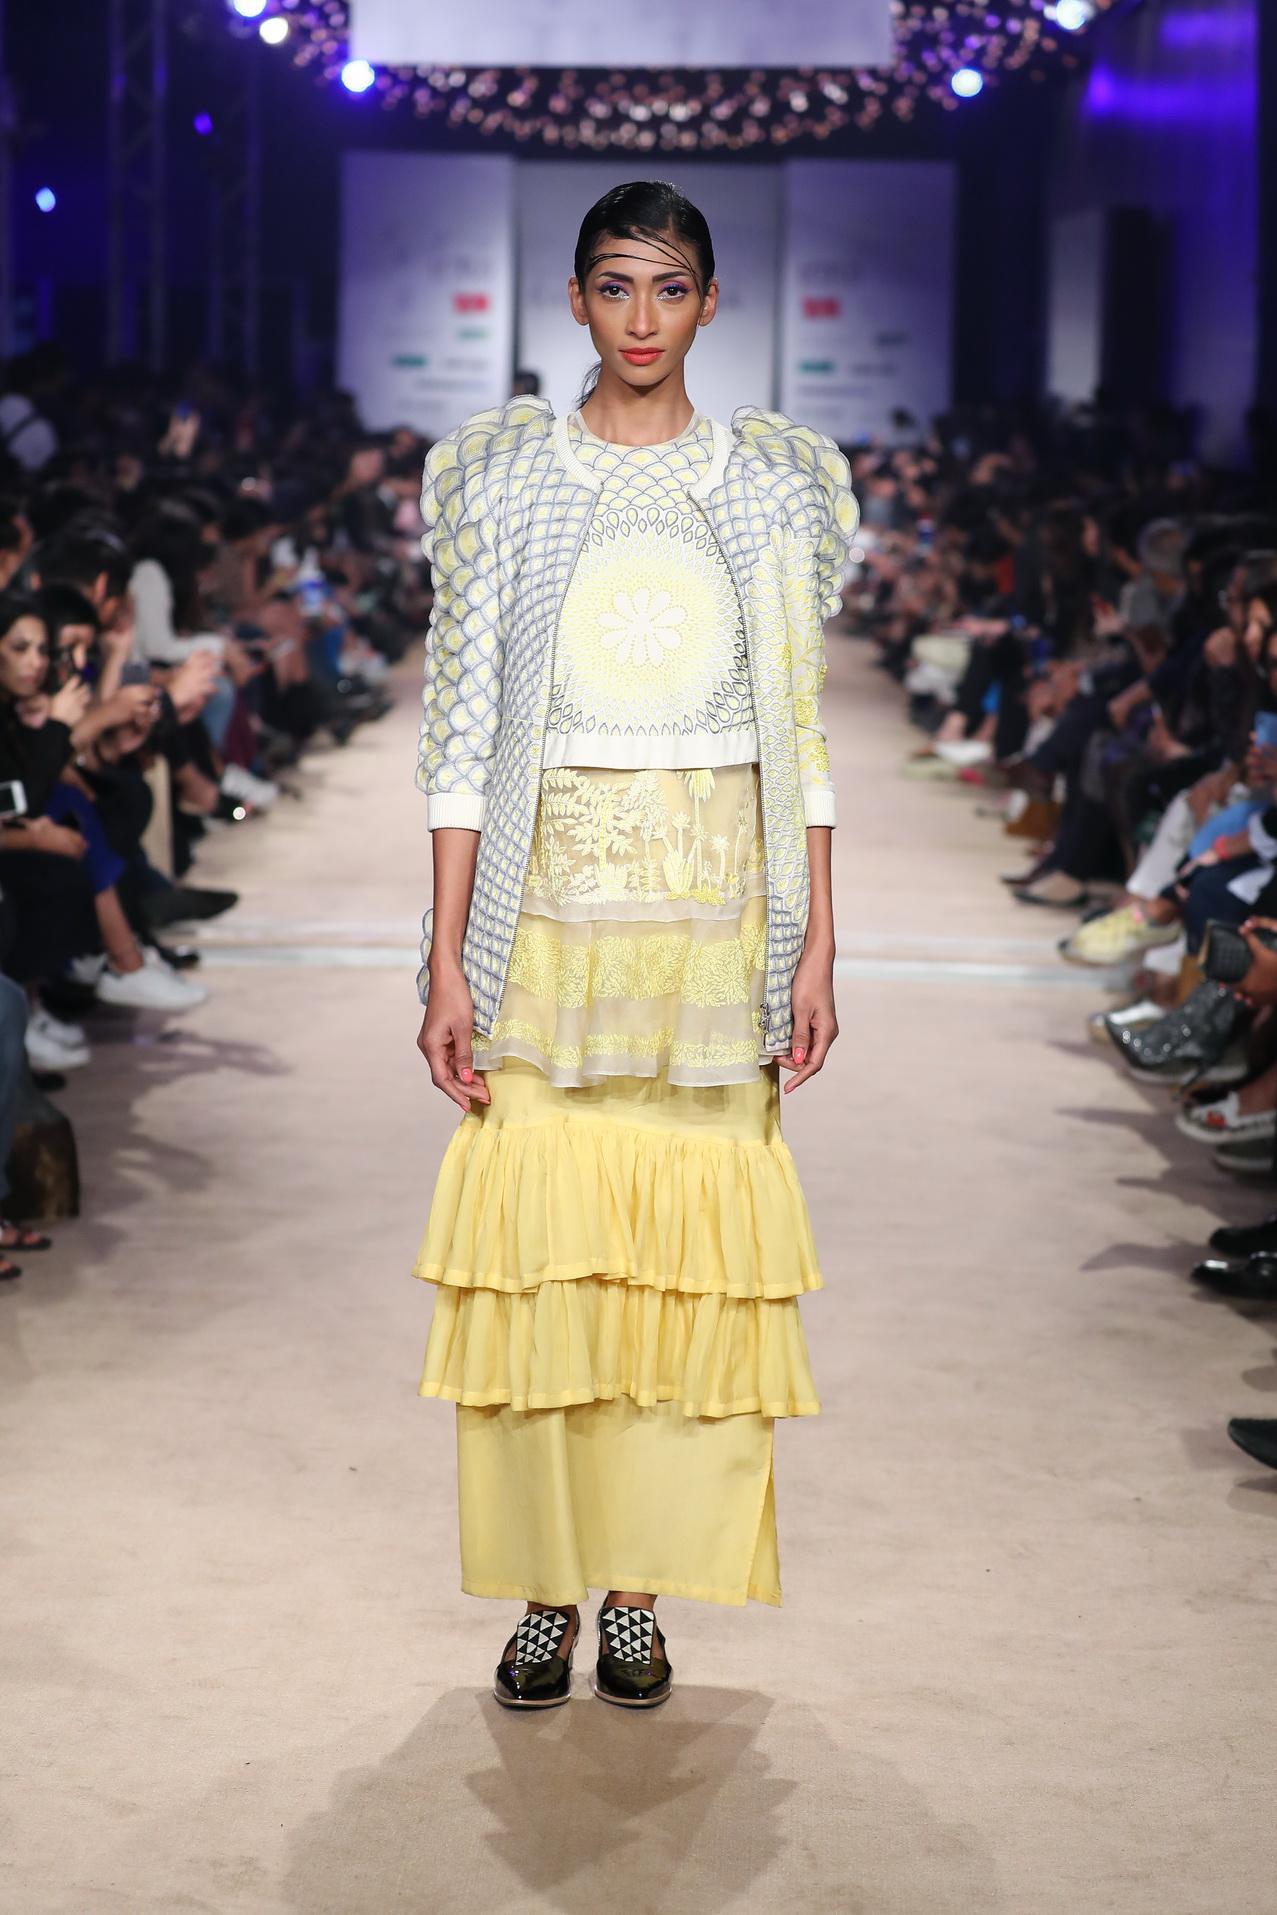 Rahul Mishra Celebrated 10 Years In Fashion At Lotus Make Up India Fashion Week The Fashion Orientalist